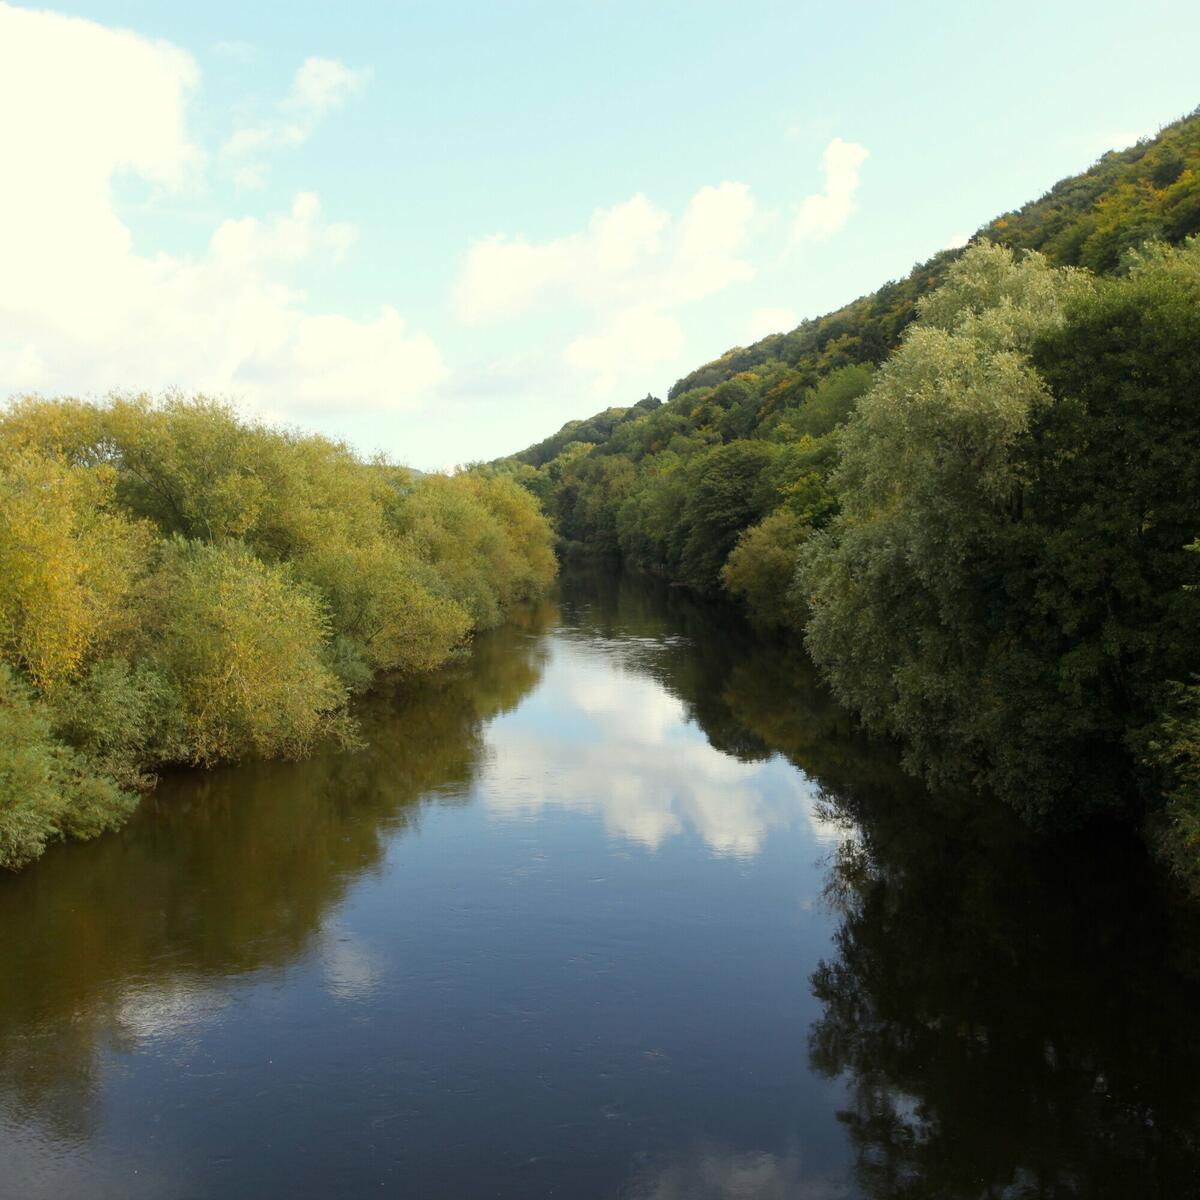 Canoe the Wye upstream from Kerne Bridge